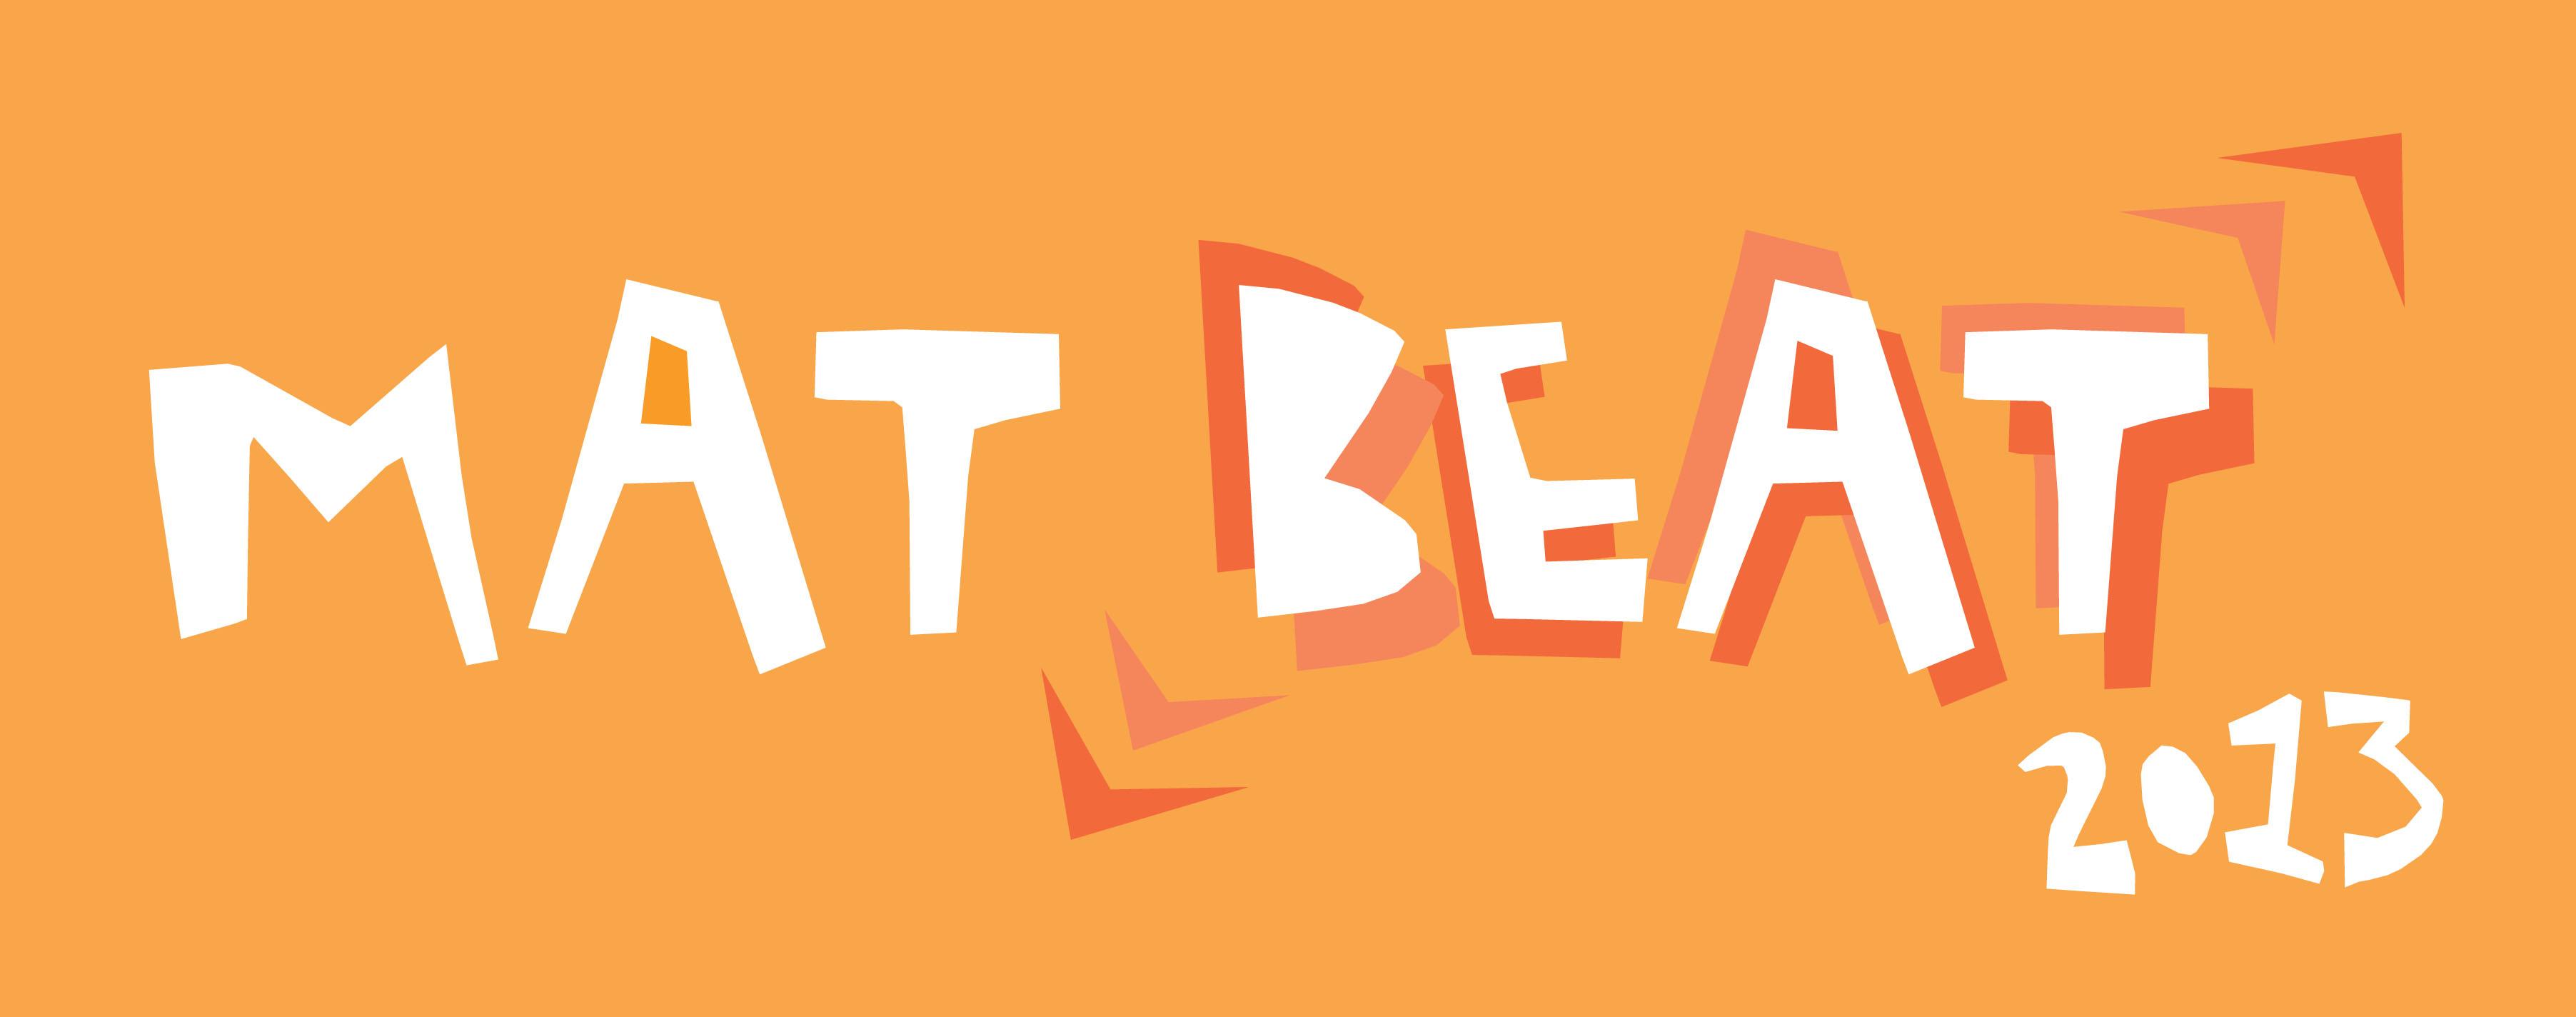 matbeat heading